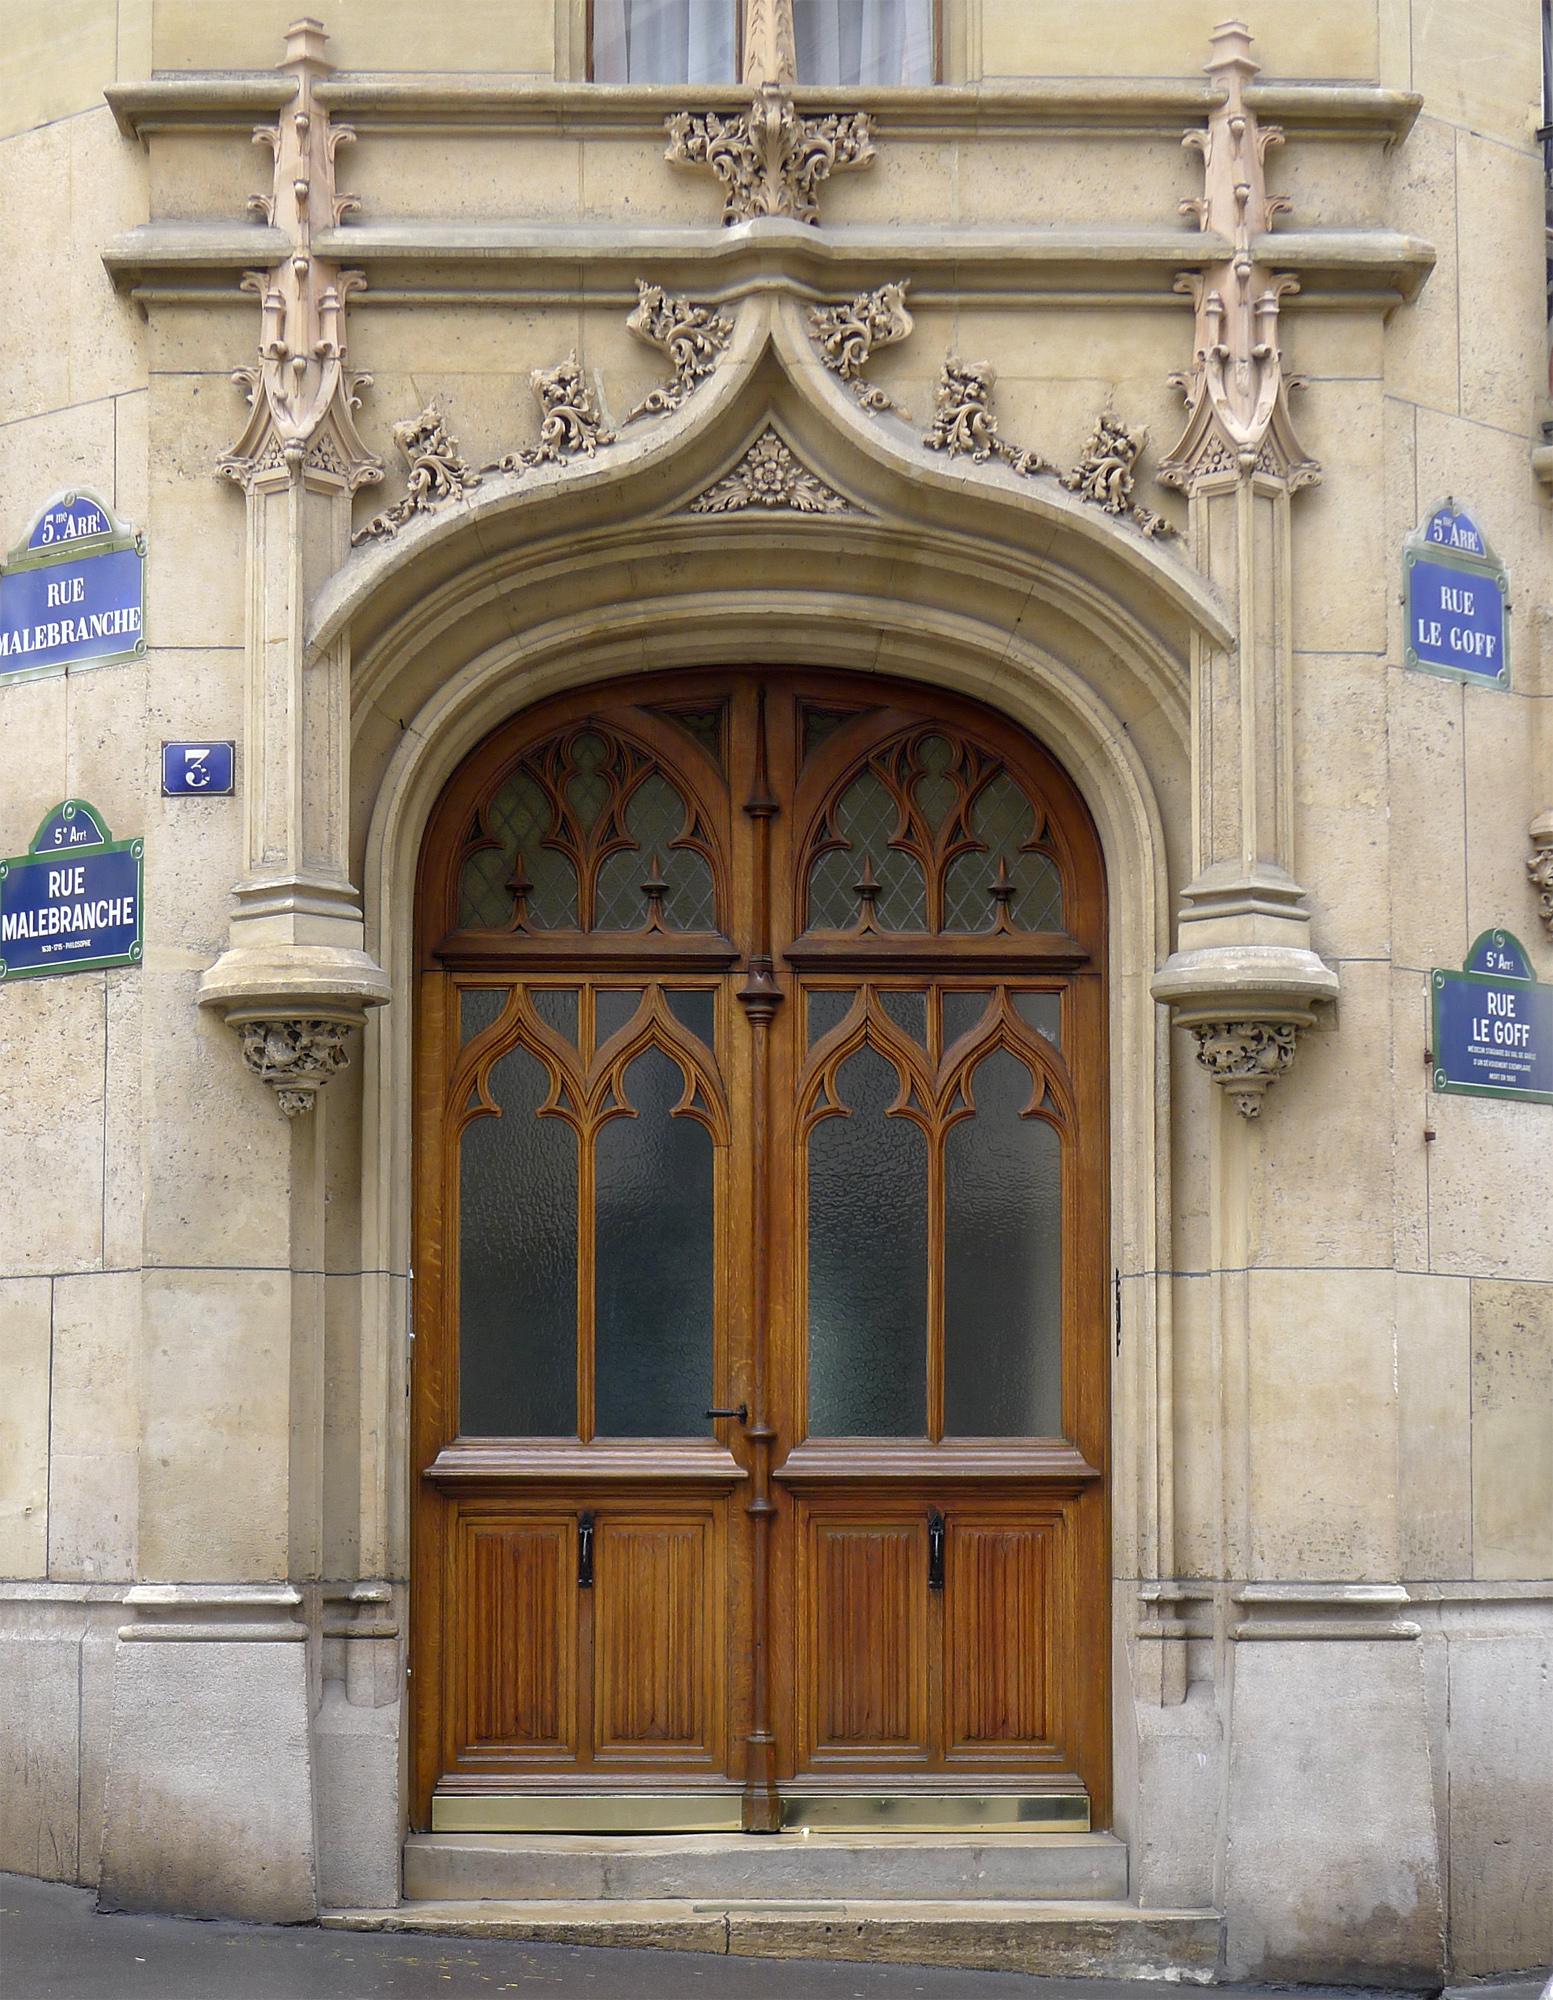 File P1250574 Paris V Rue Malebranche N3 Porte Gothique